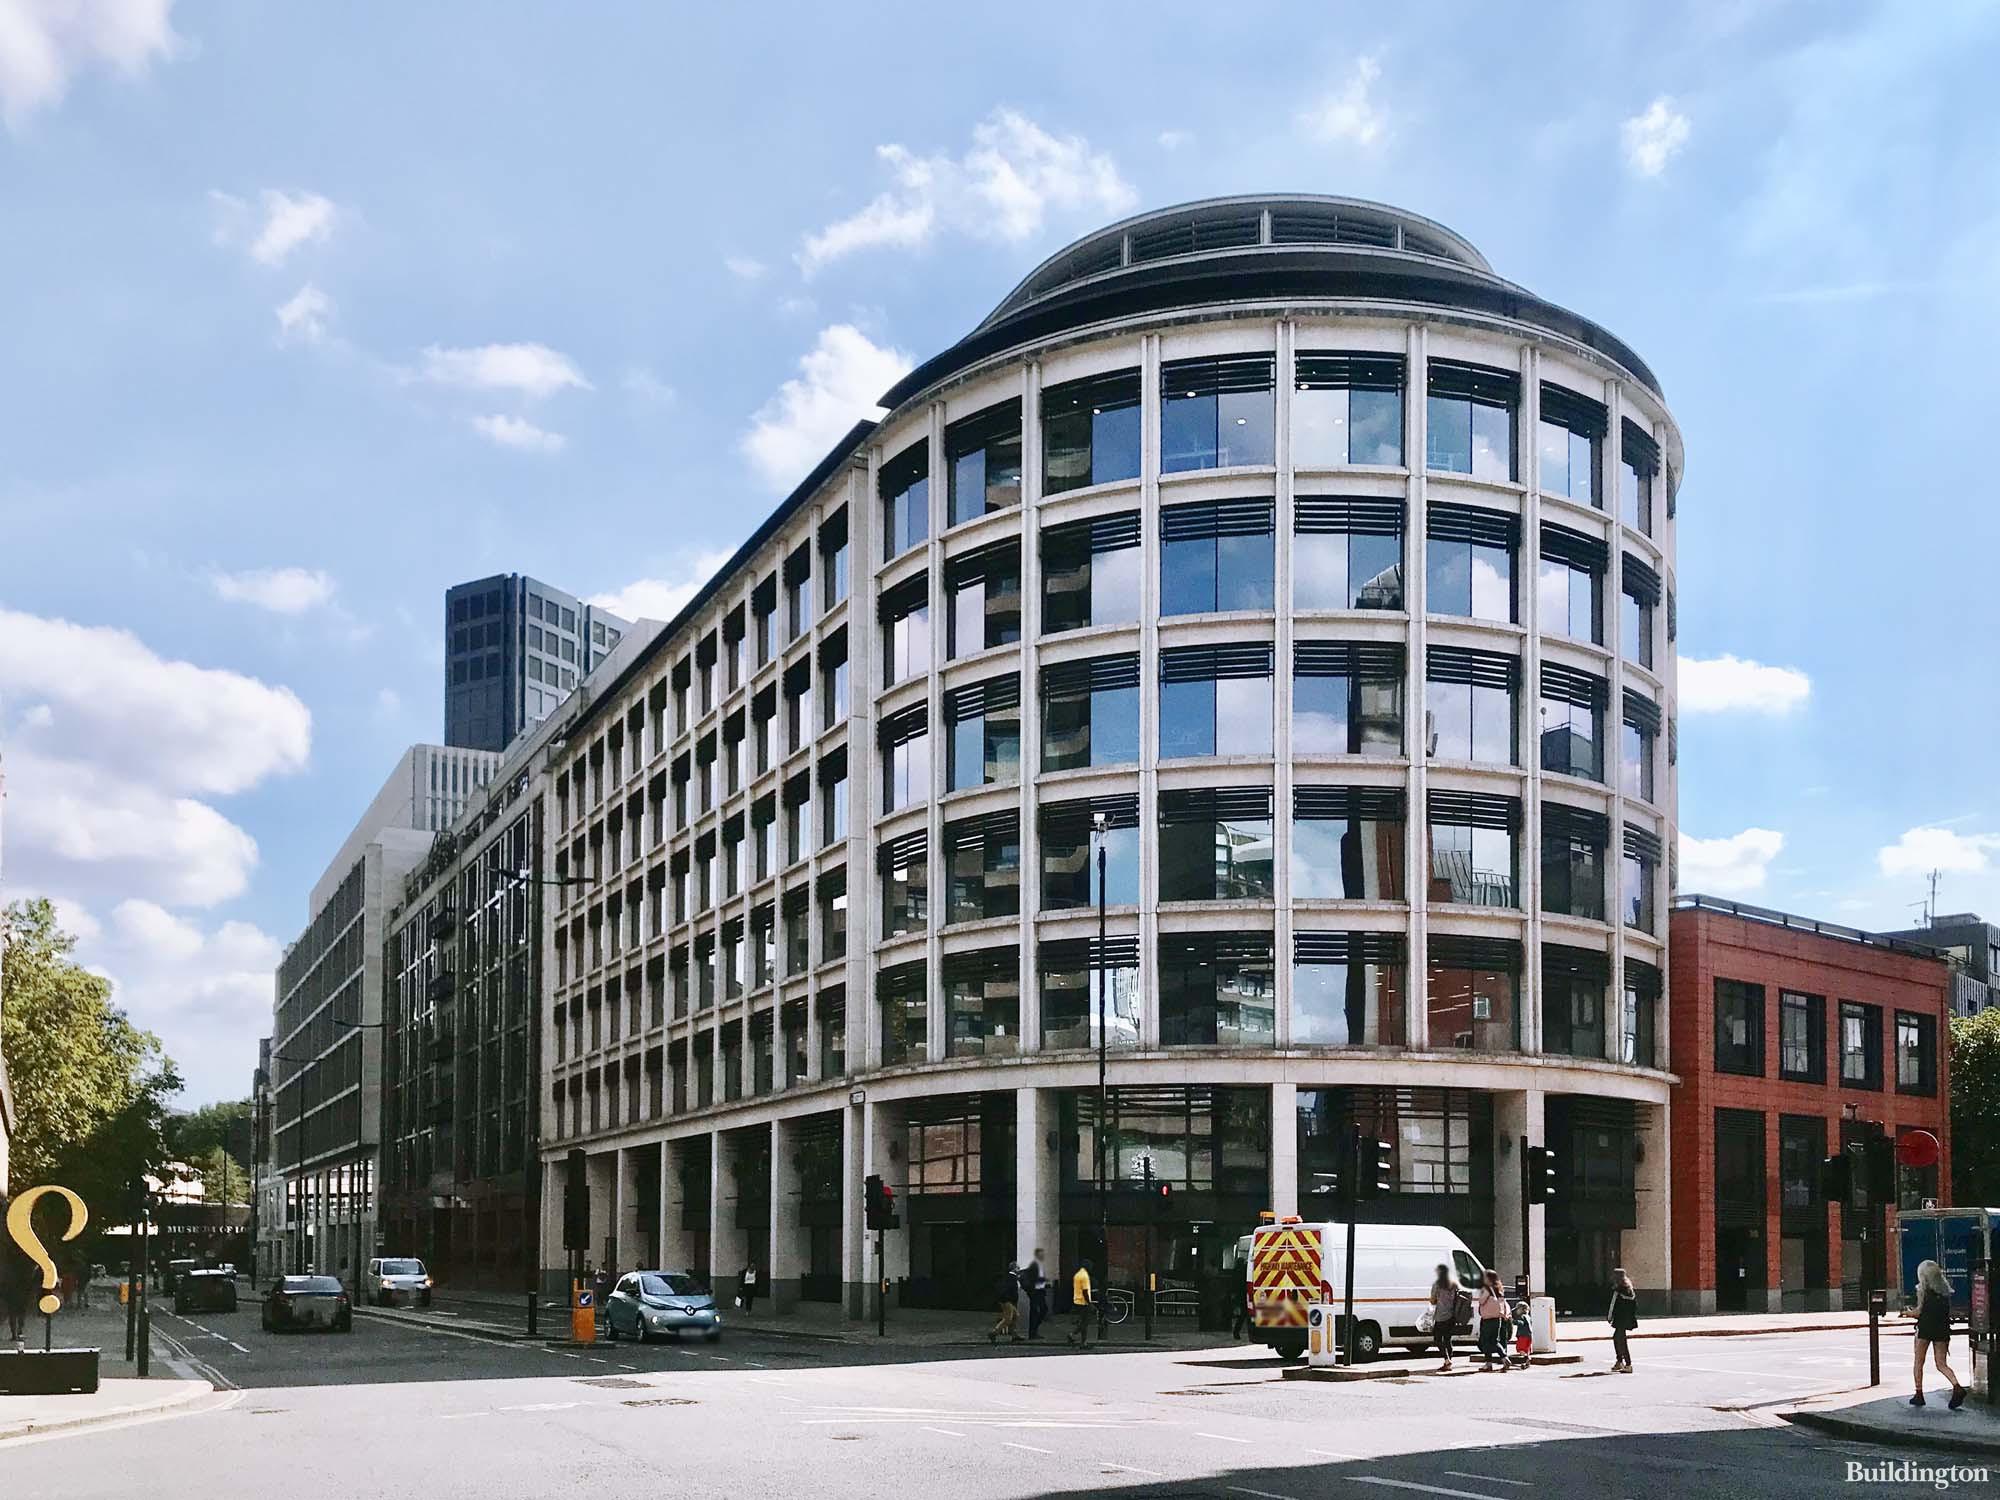 140 Aldersgate Street building designed by Sidell Architects. On the corner of Aldersgate Street and Long Lane.